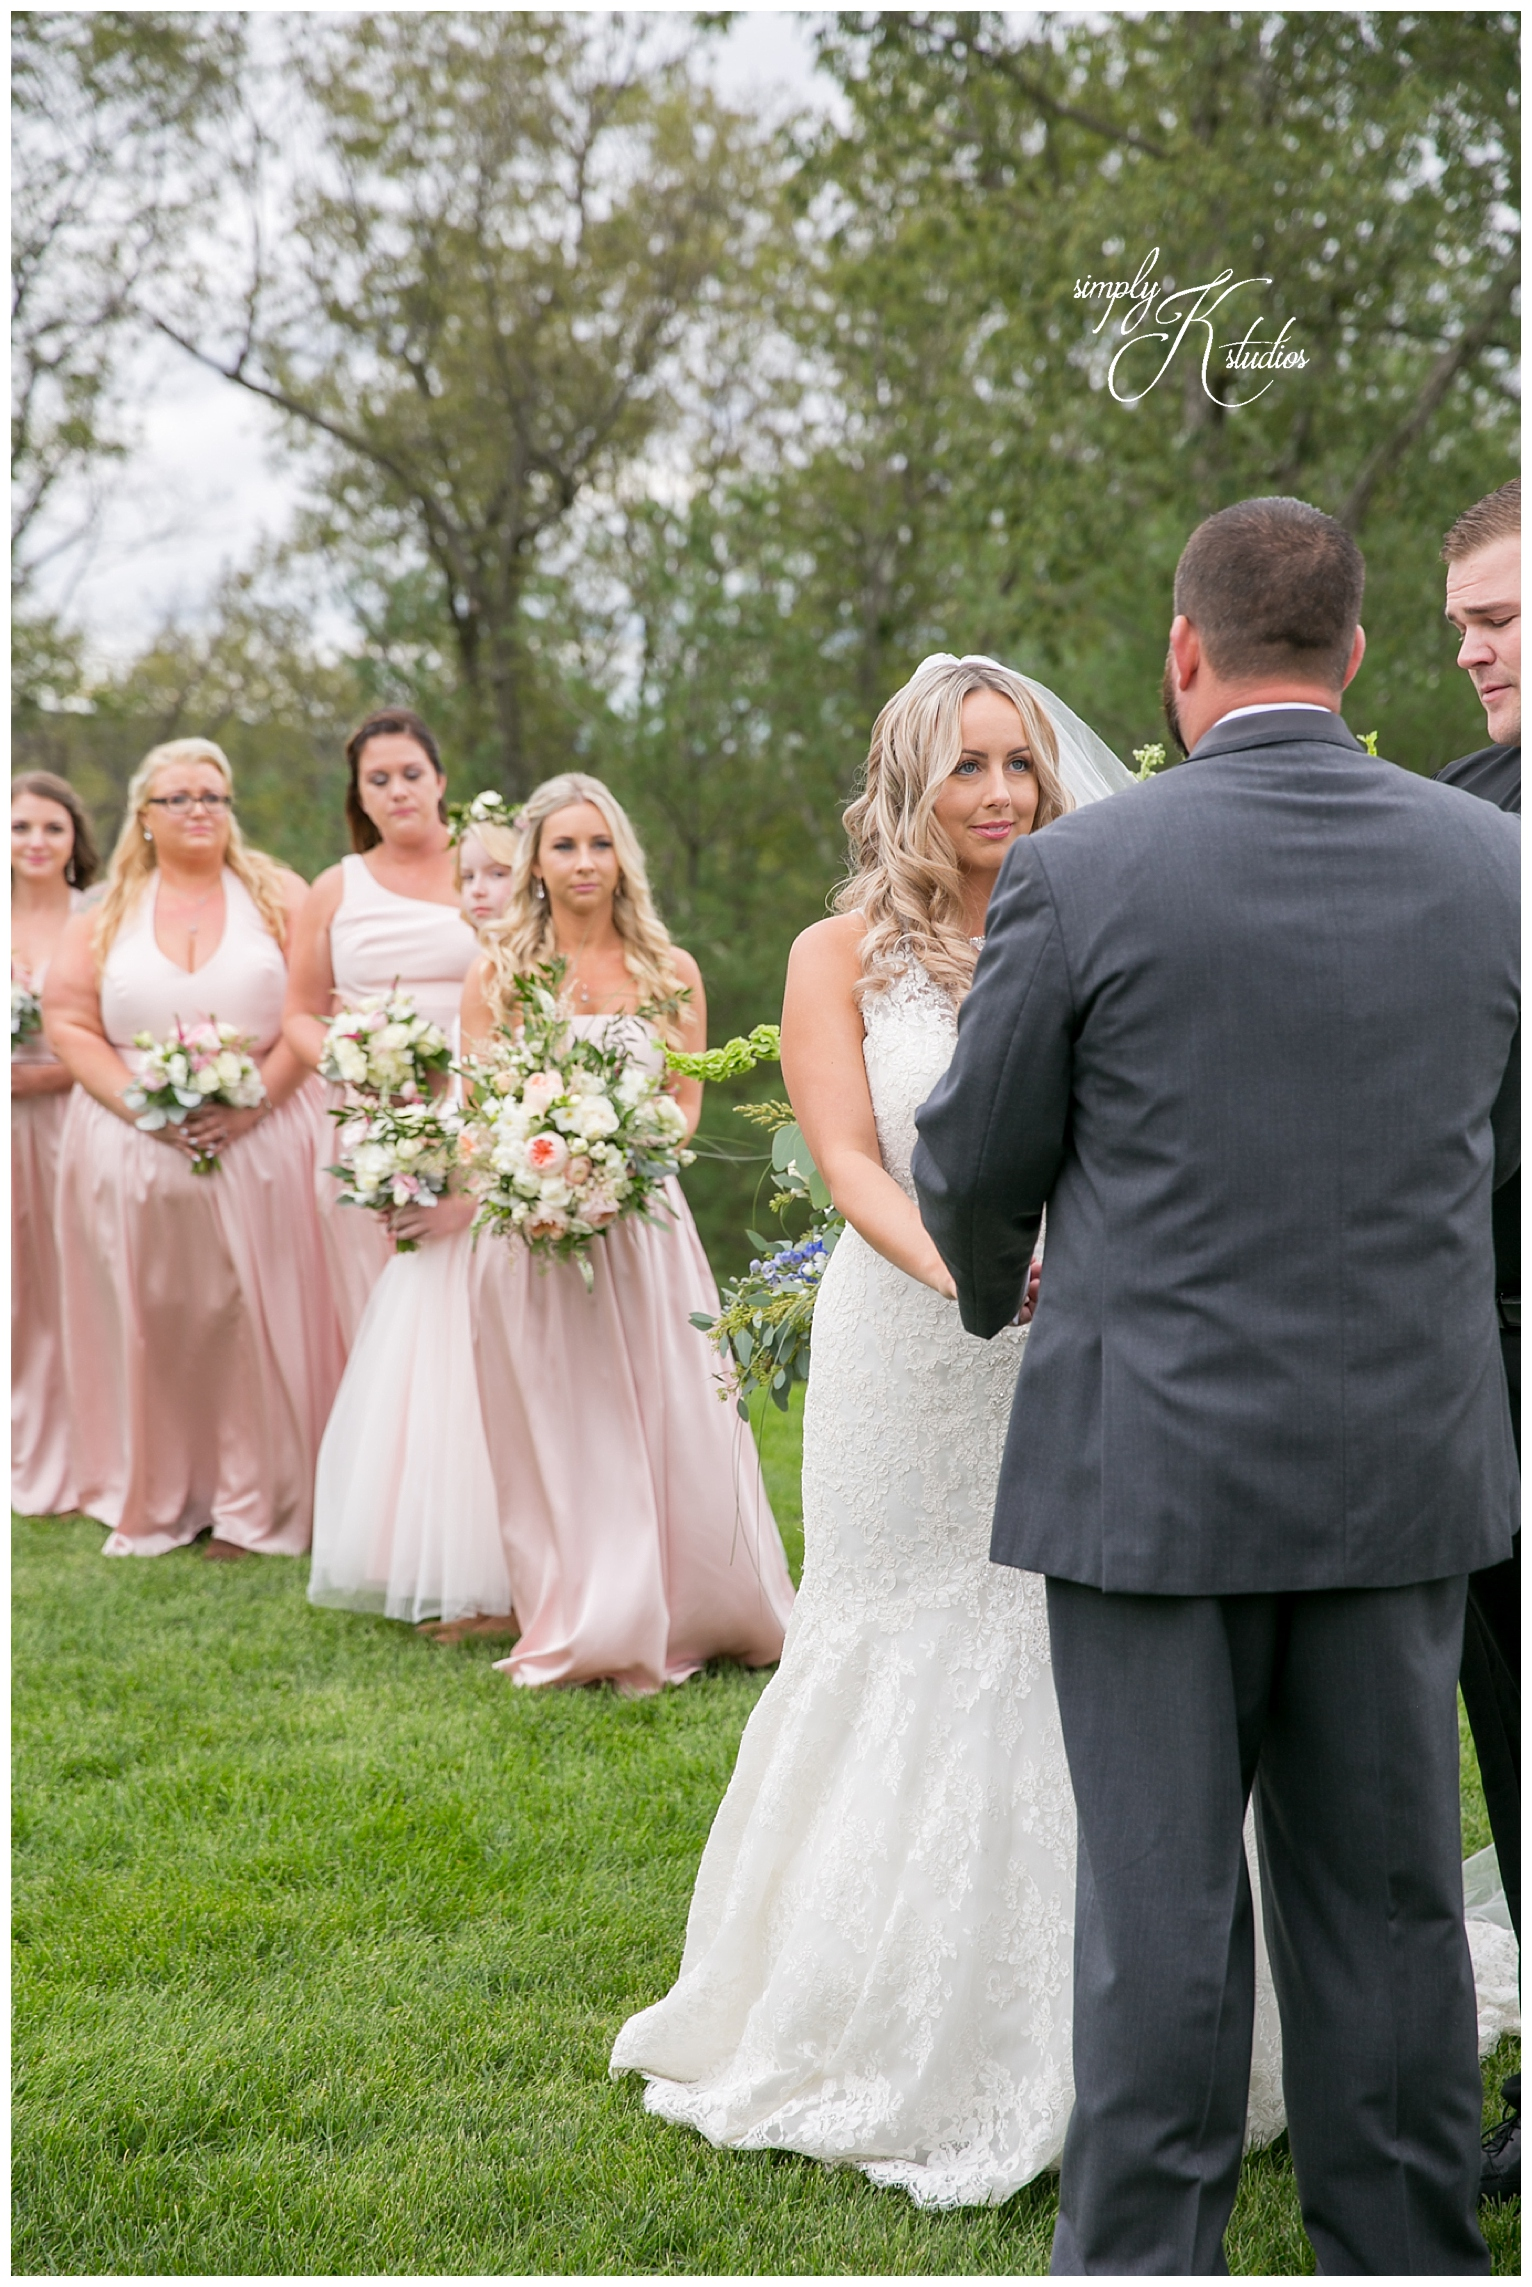 Wedding Ceremony in CT.jpg